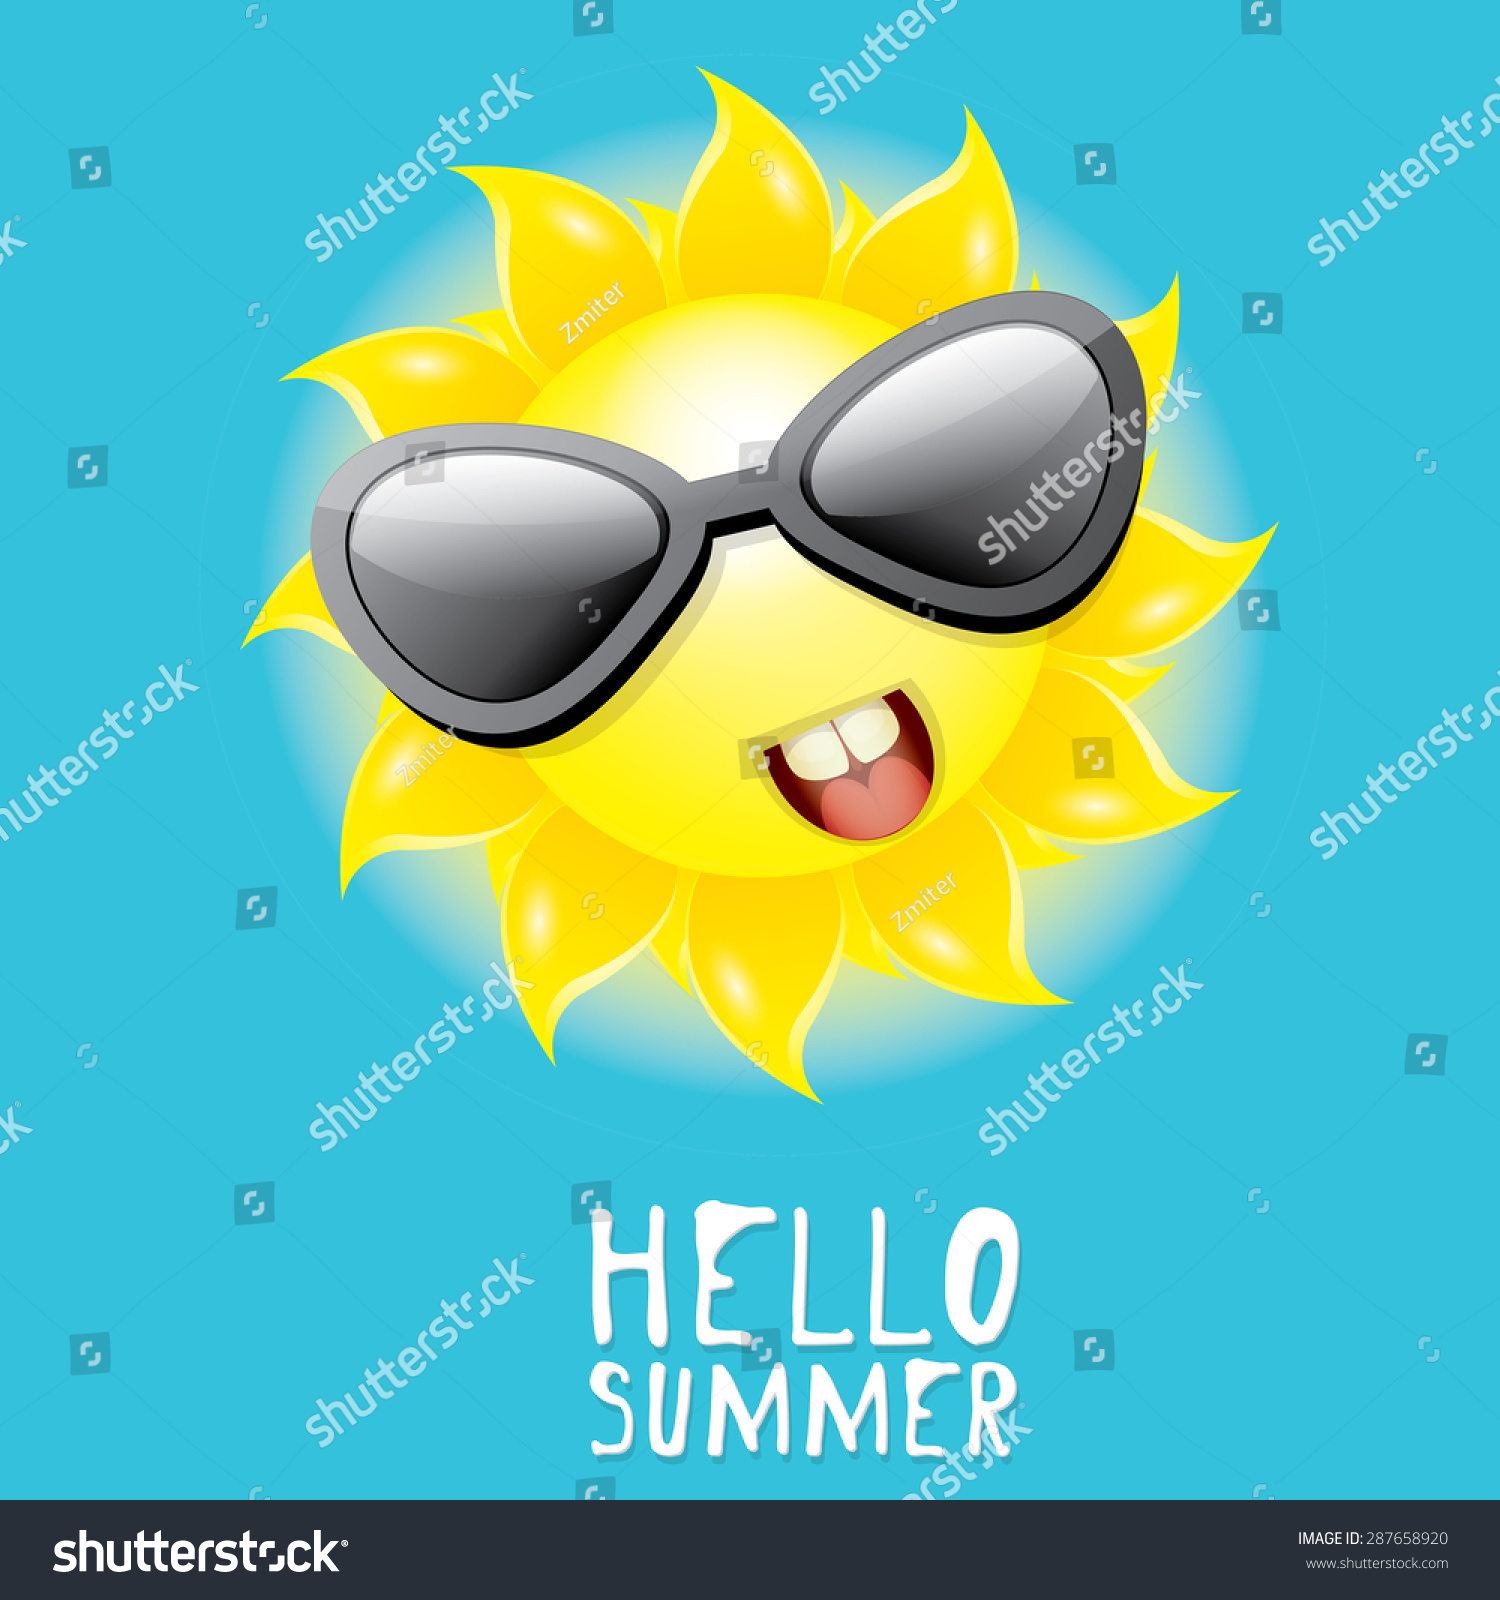 Hello Summer Vector Summer Smiling Sun Stock Vector 287658920   Shutterstock